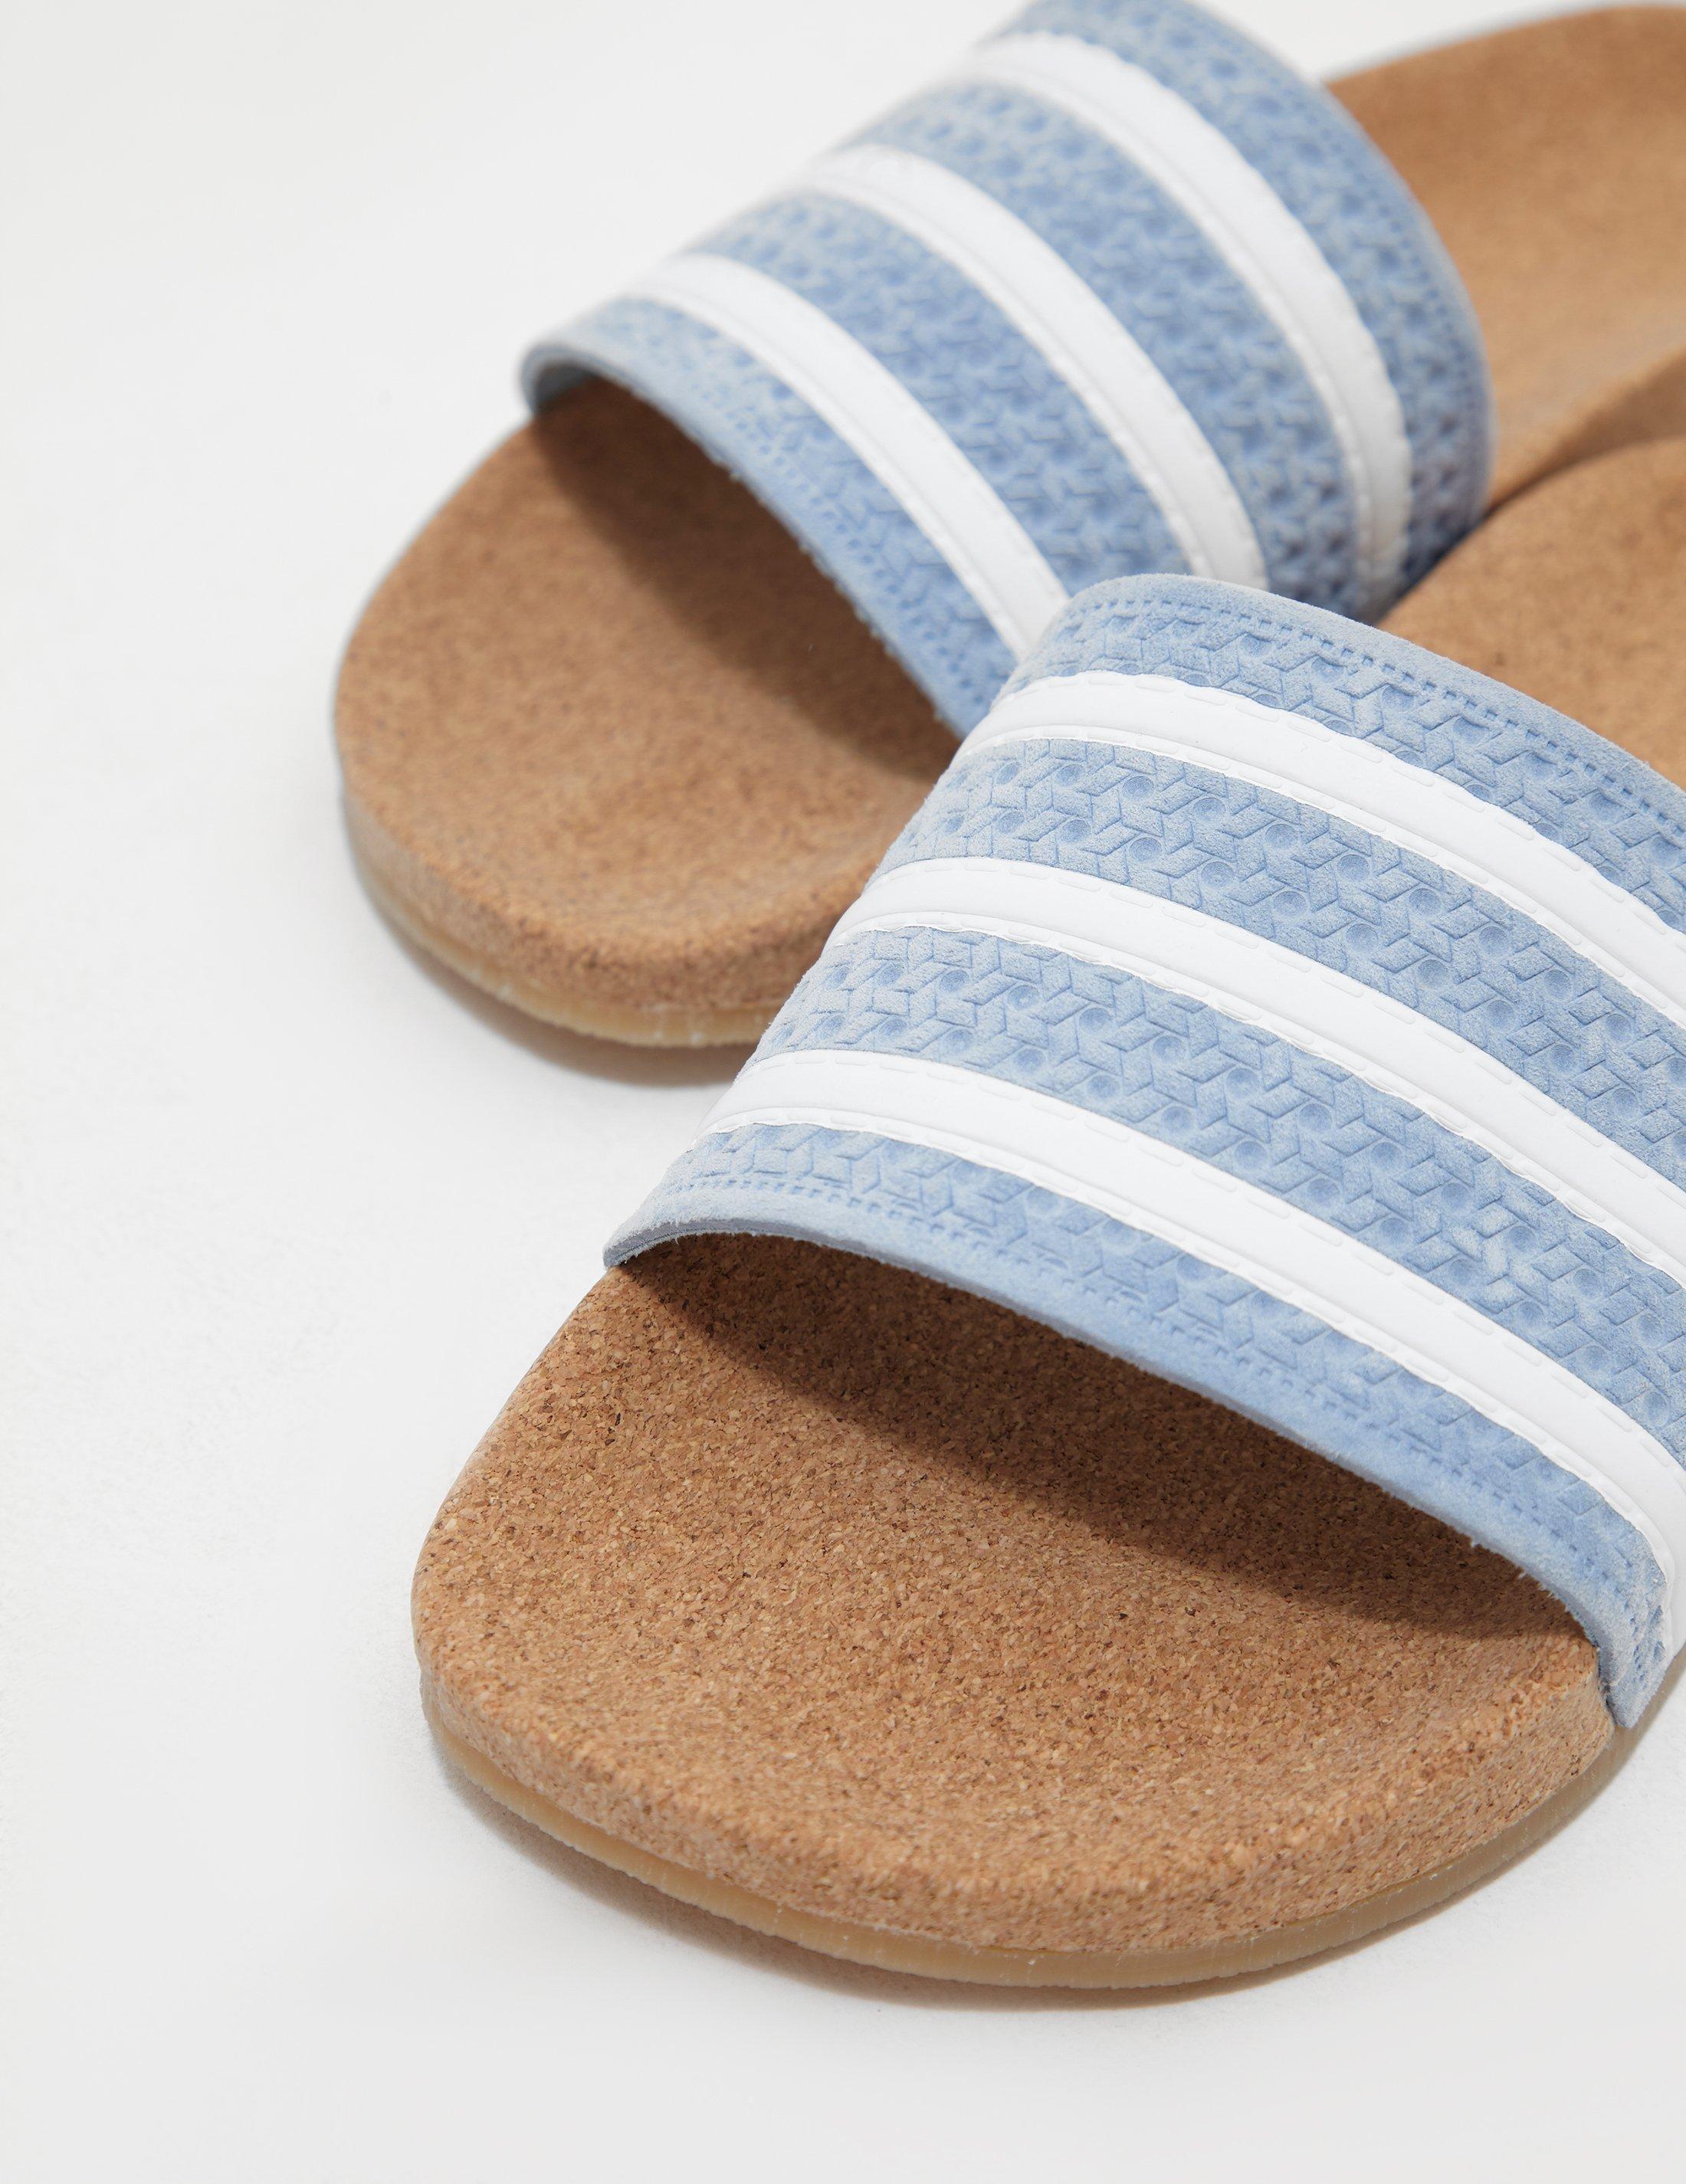 44f727f2563ca Lyst - adidas Originals Womens Adilette Cork Slides Blue in Blue